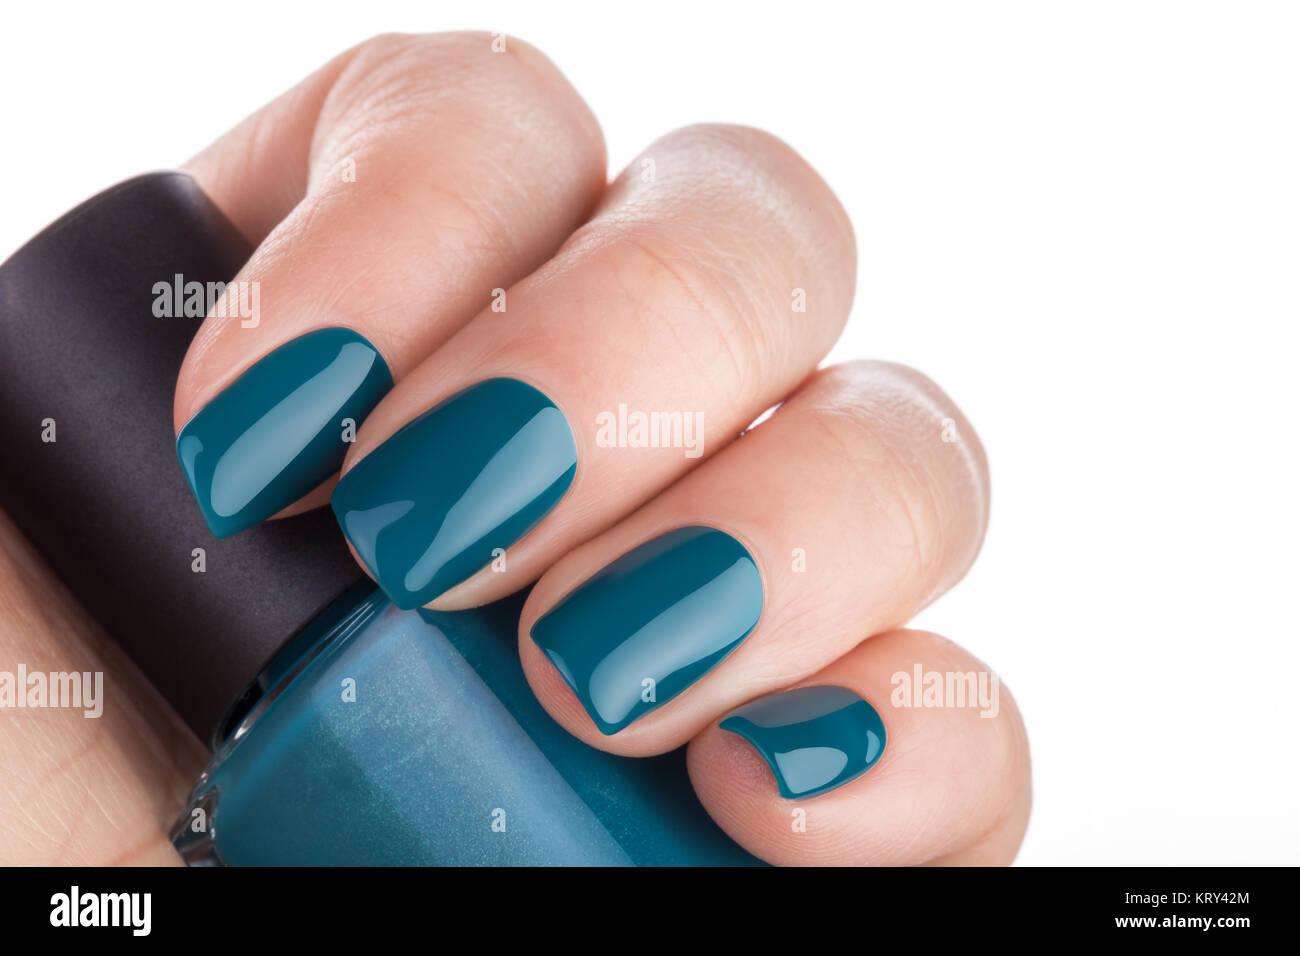 Nice nails Stock Photo, Royalty Free Image: 169626316 - Alamy